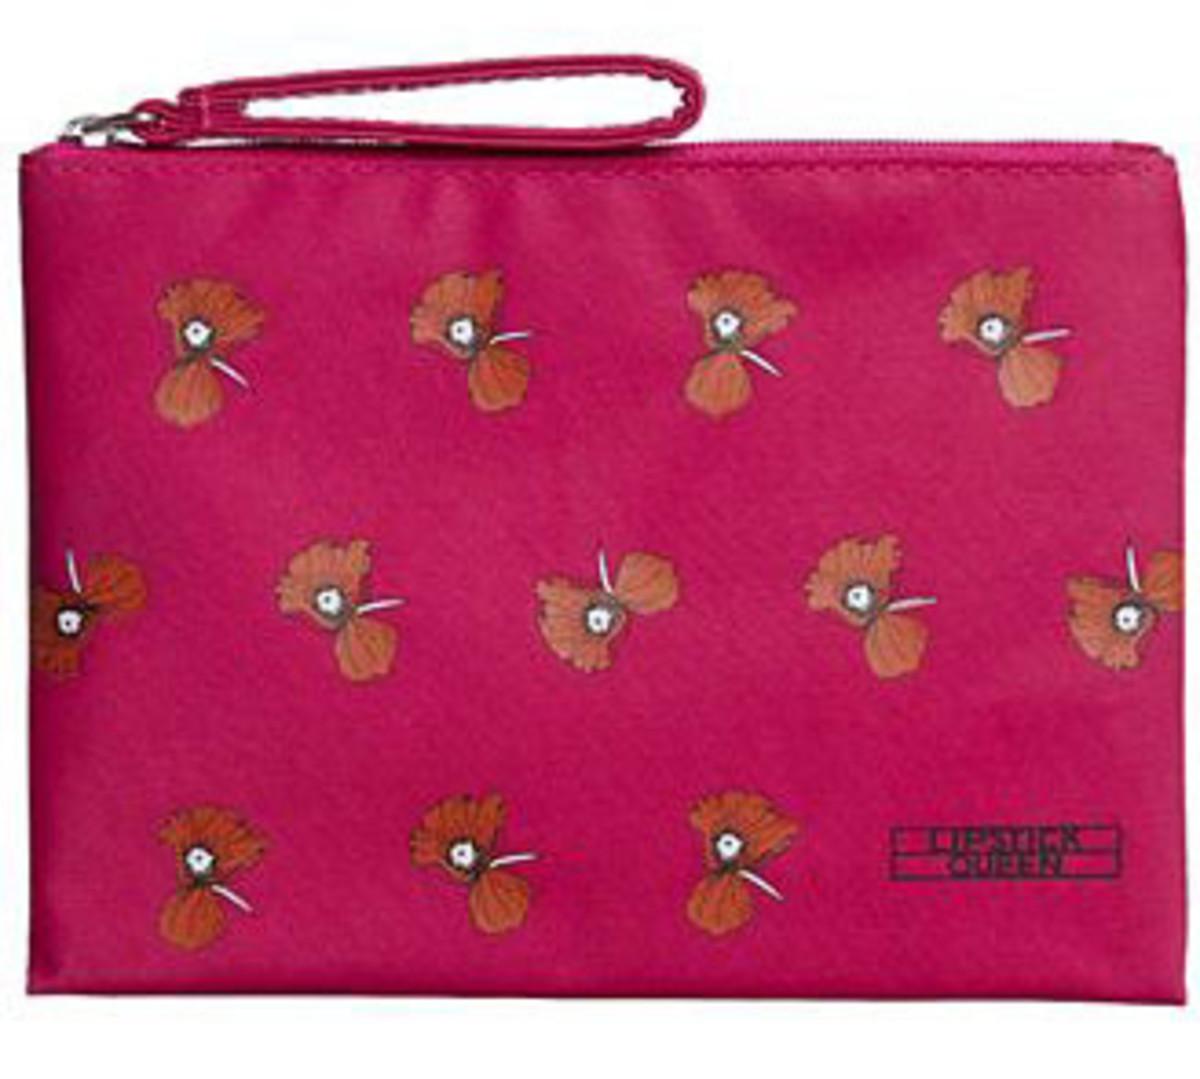 Lipstick Queen Pink Poppy bag